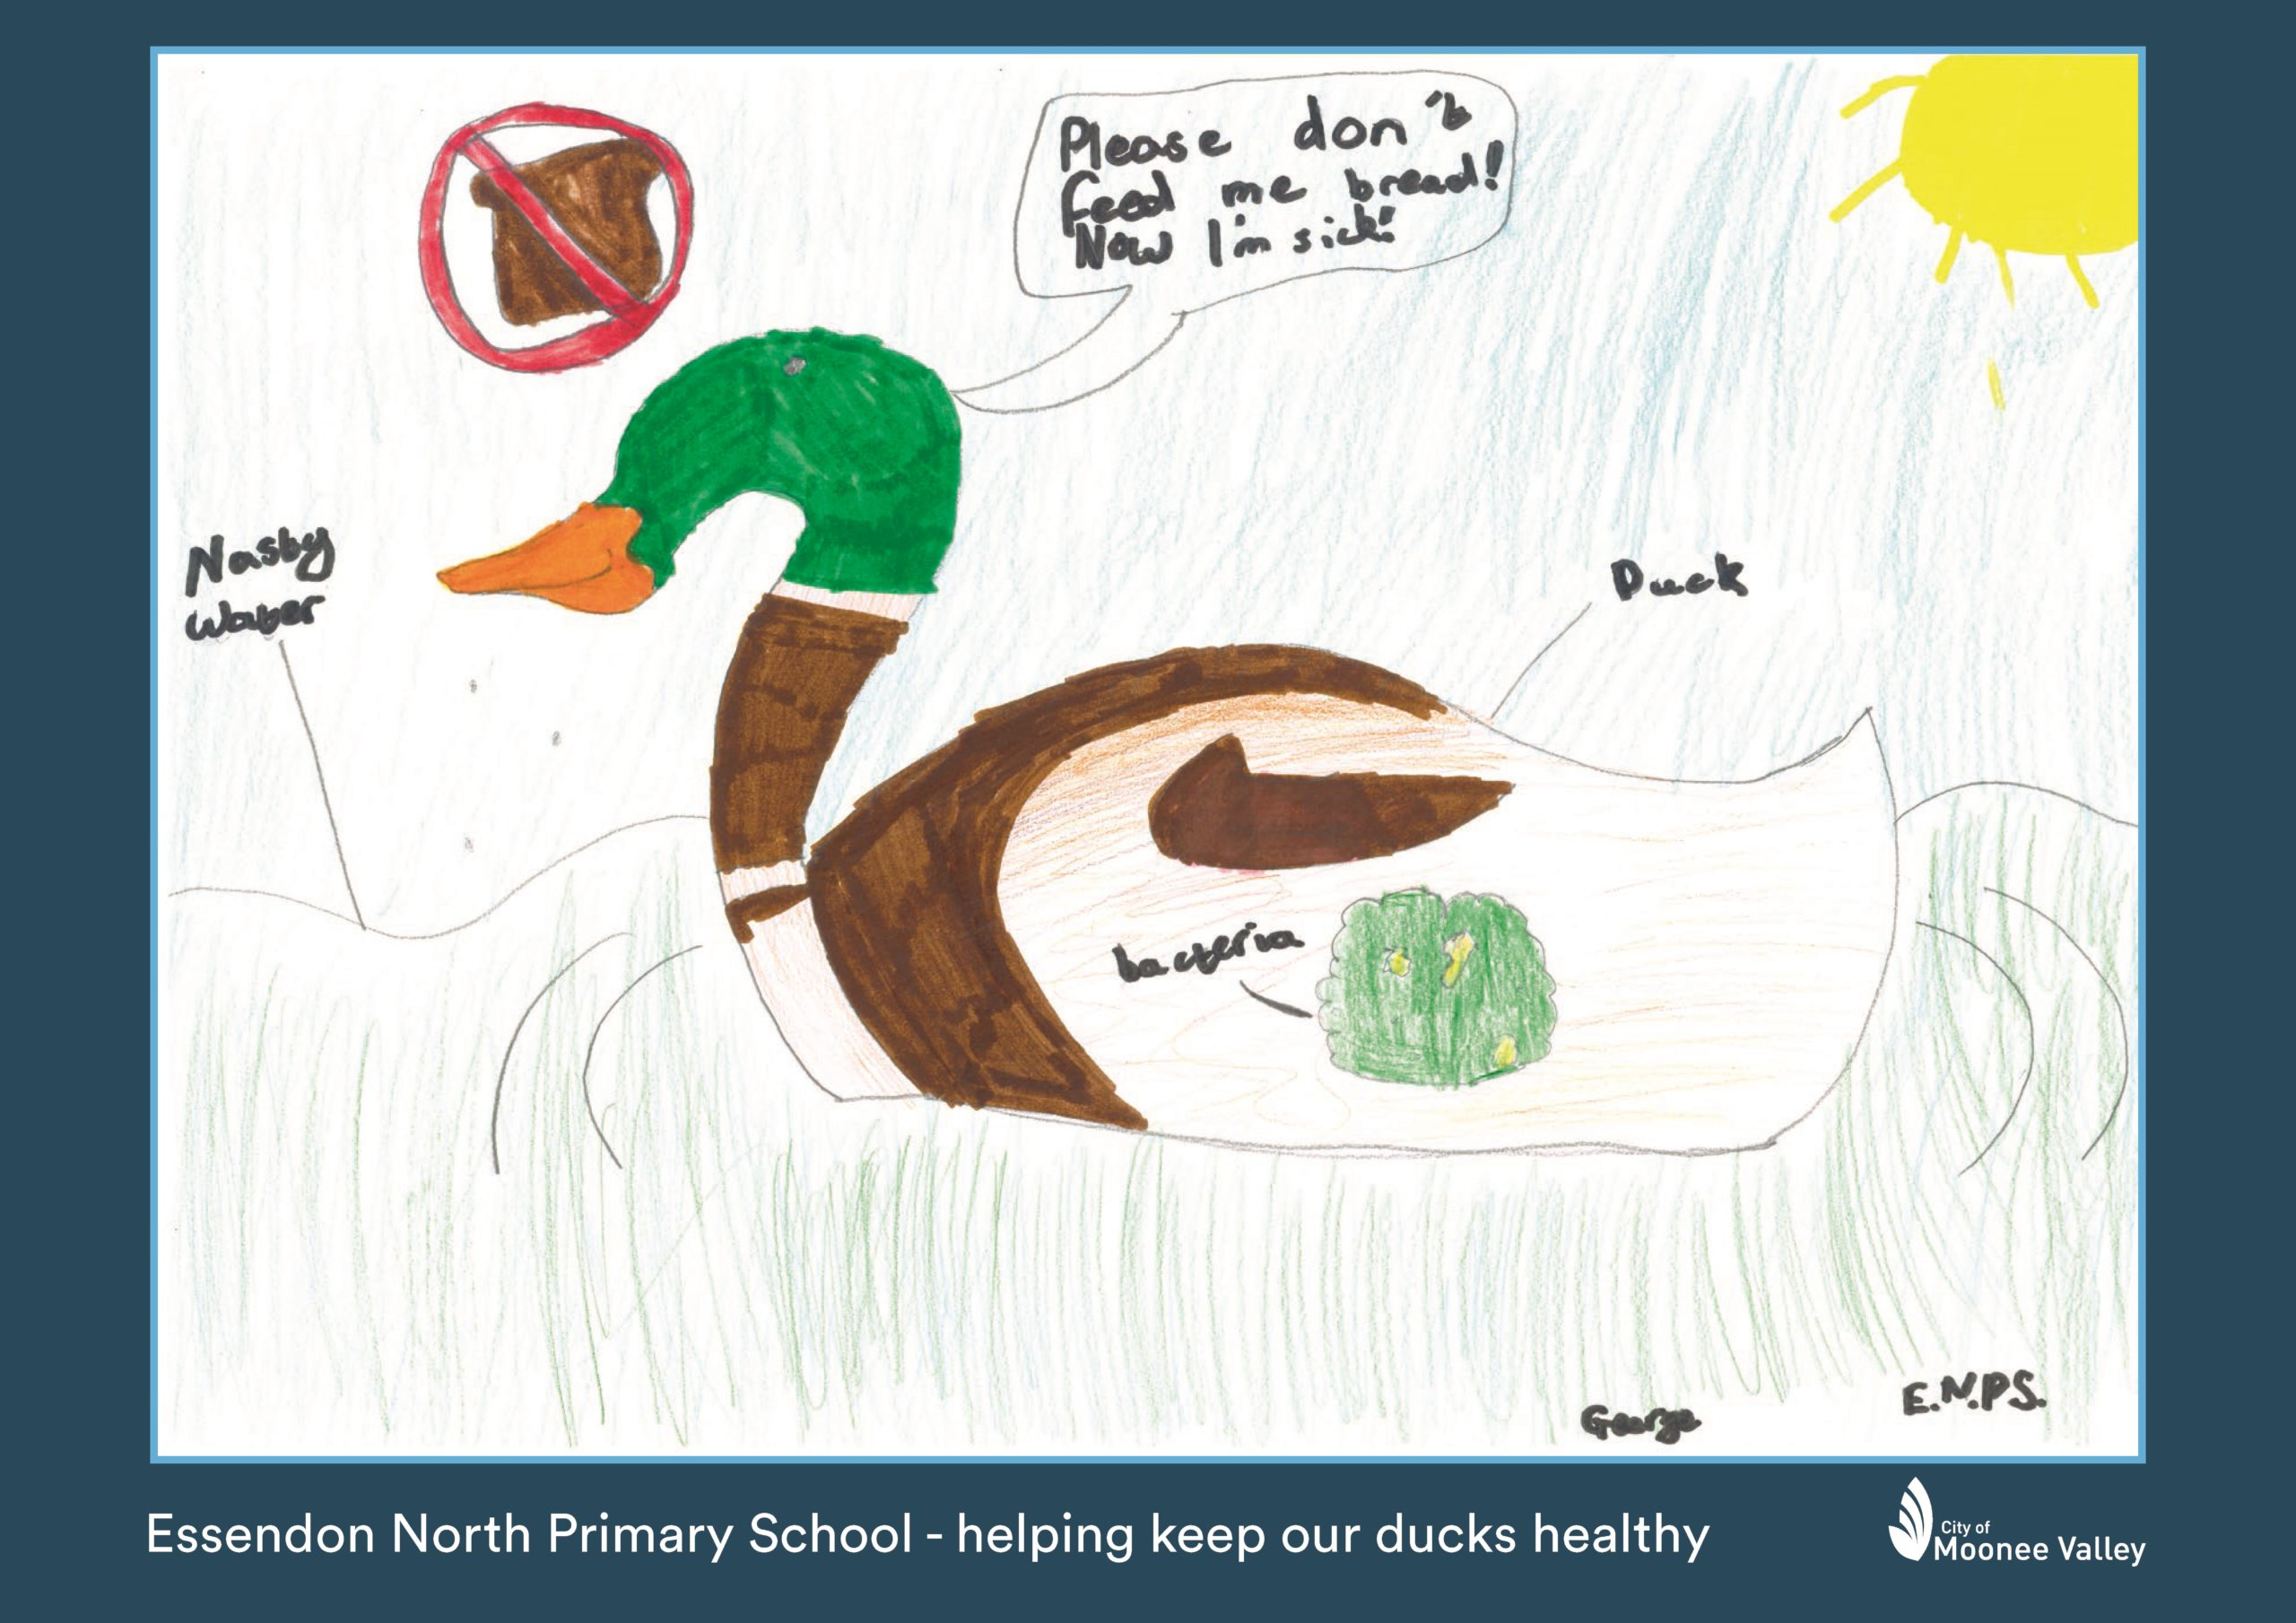 20 215125 ENPS Woodlands Park Duck Poster George